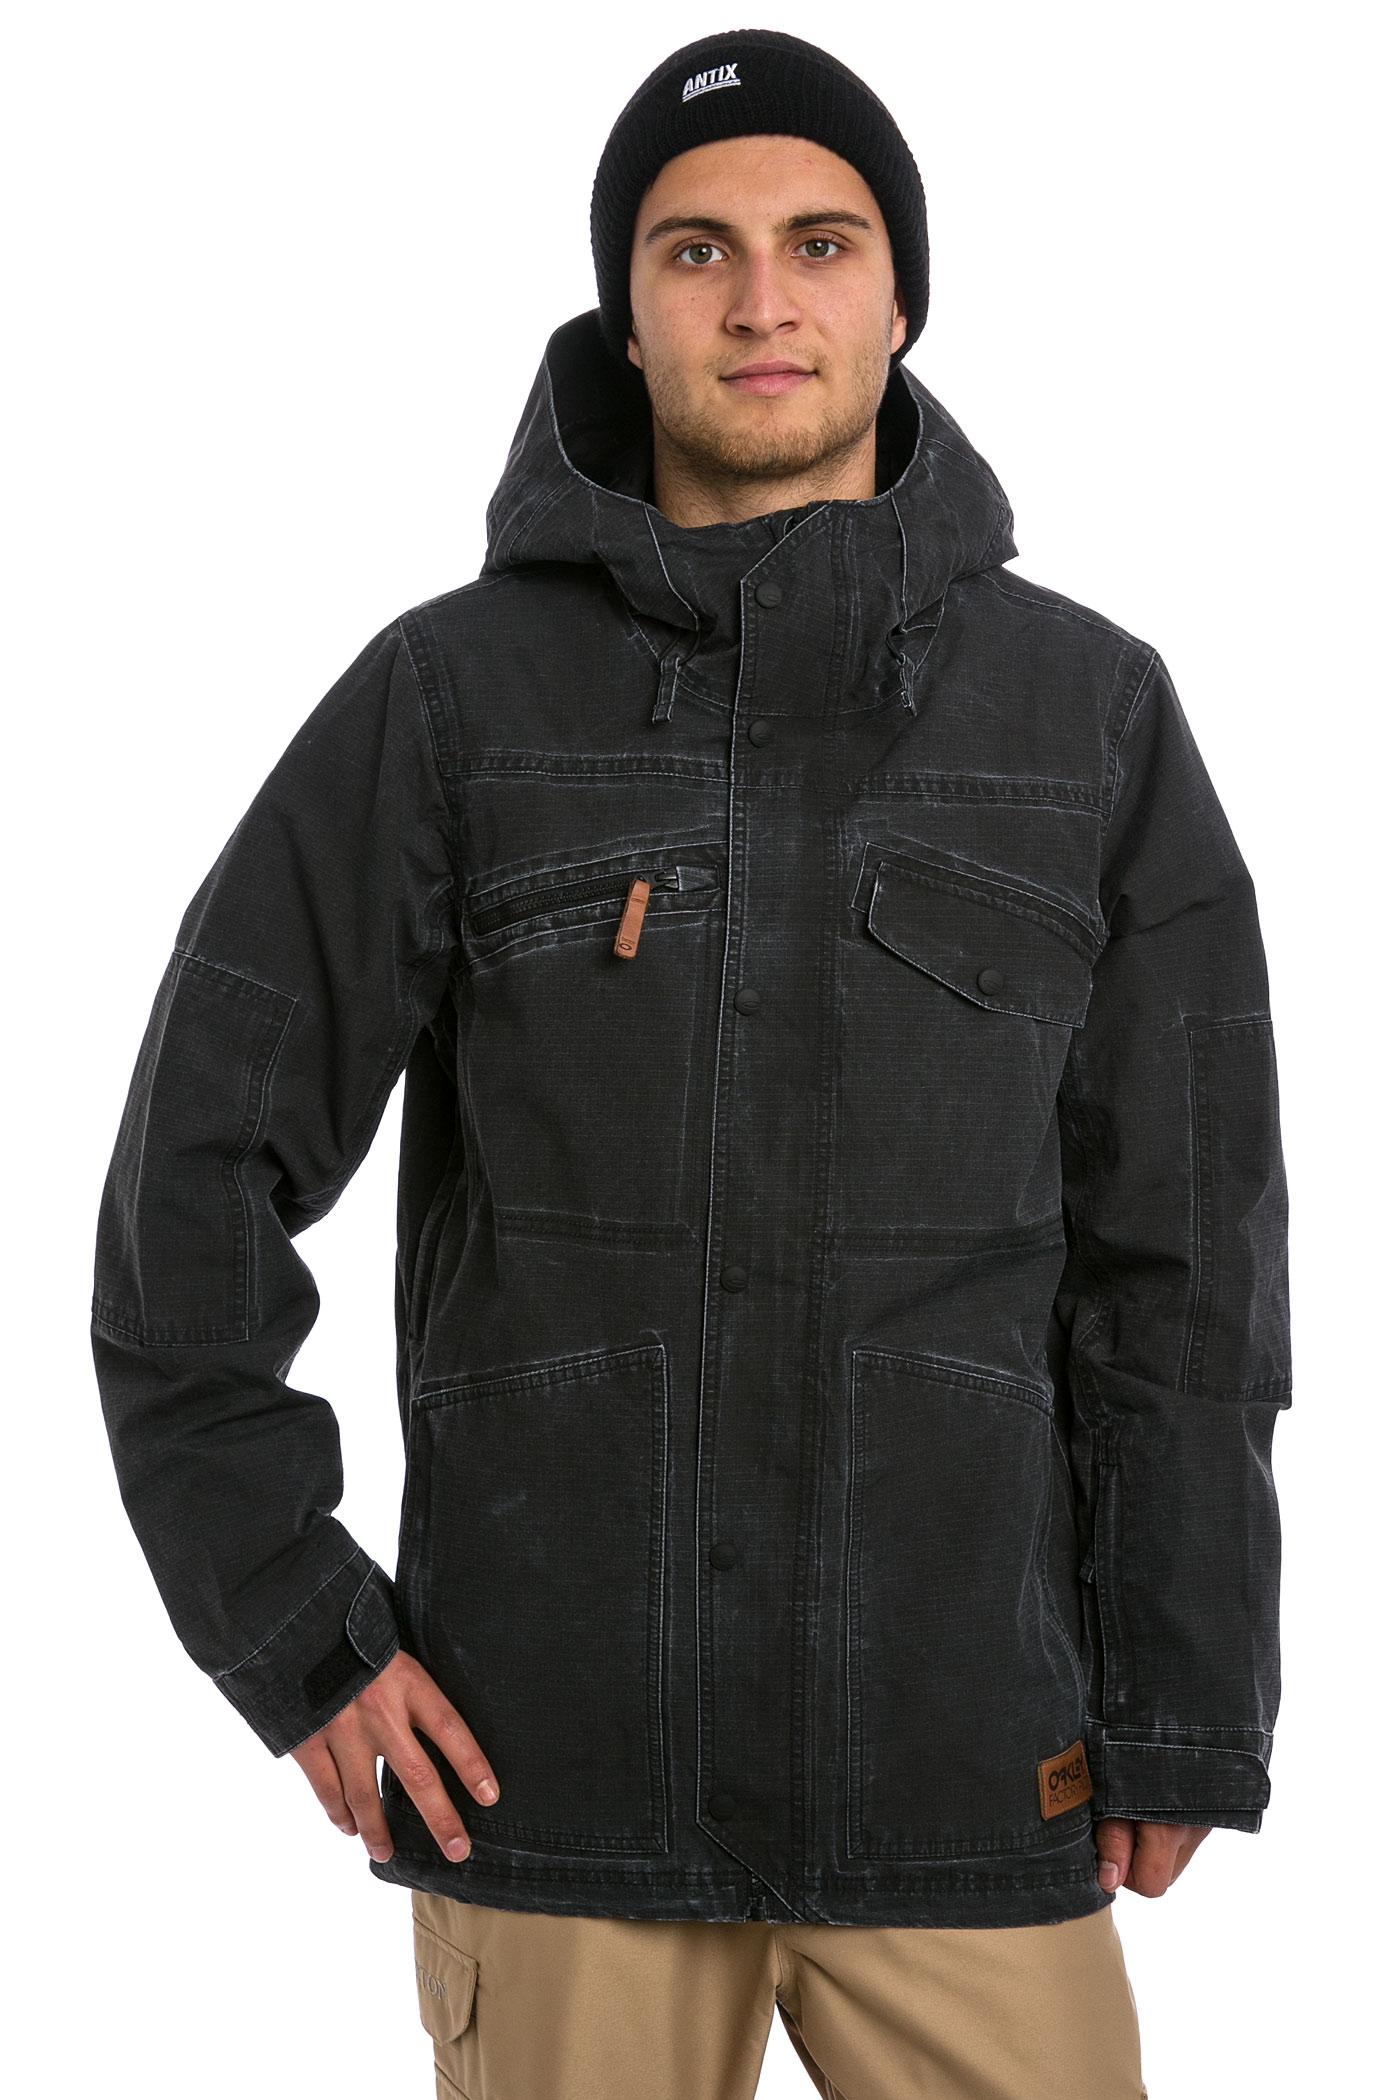 b6f1d66c19c Oakley Snowboarding Jacket Black « Heritage Malta